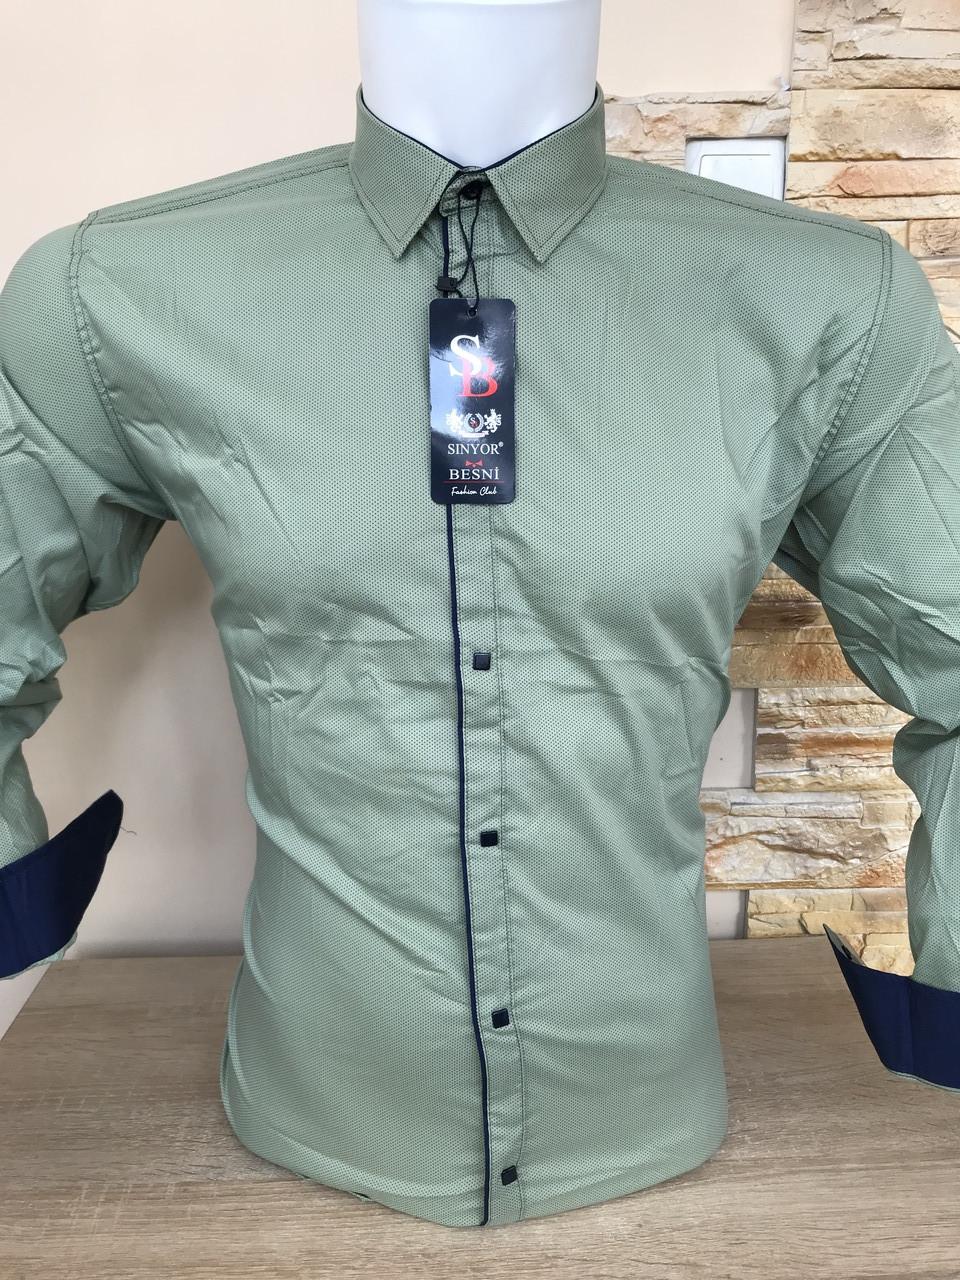 Распродажа!!! Рубашка Seniyor Besni с принтом